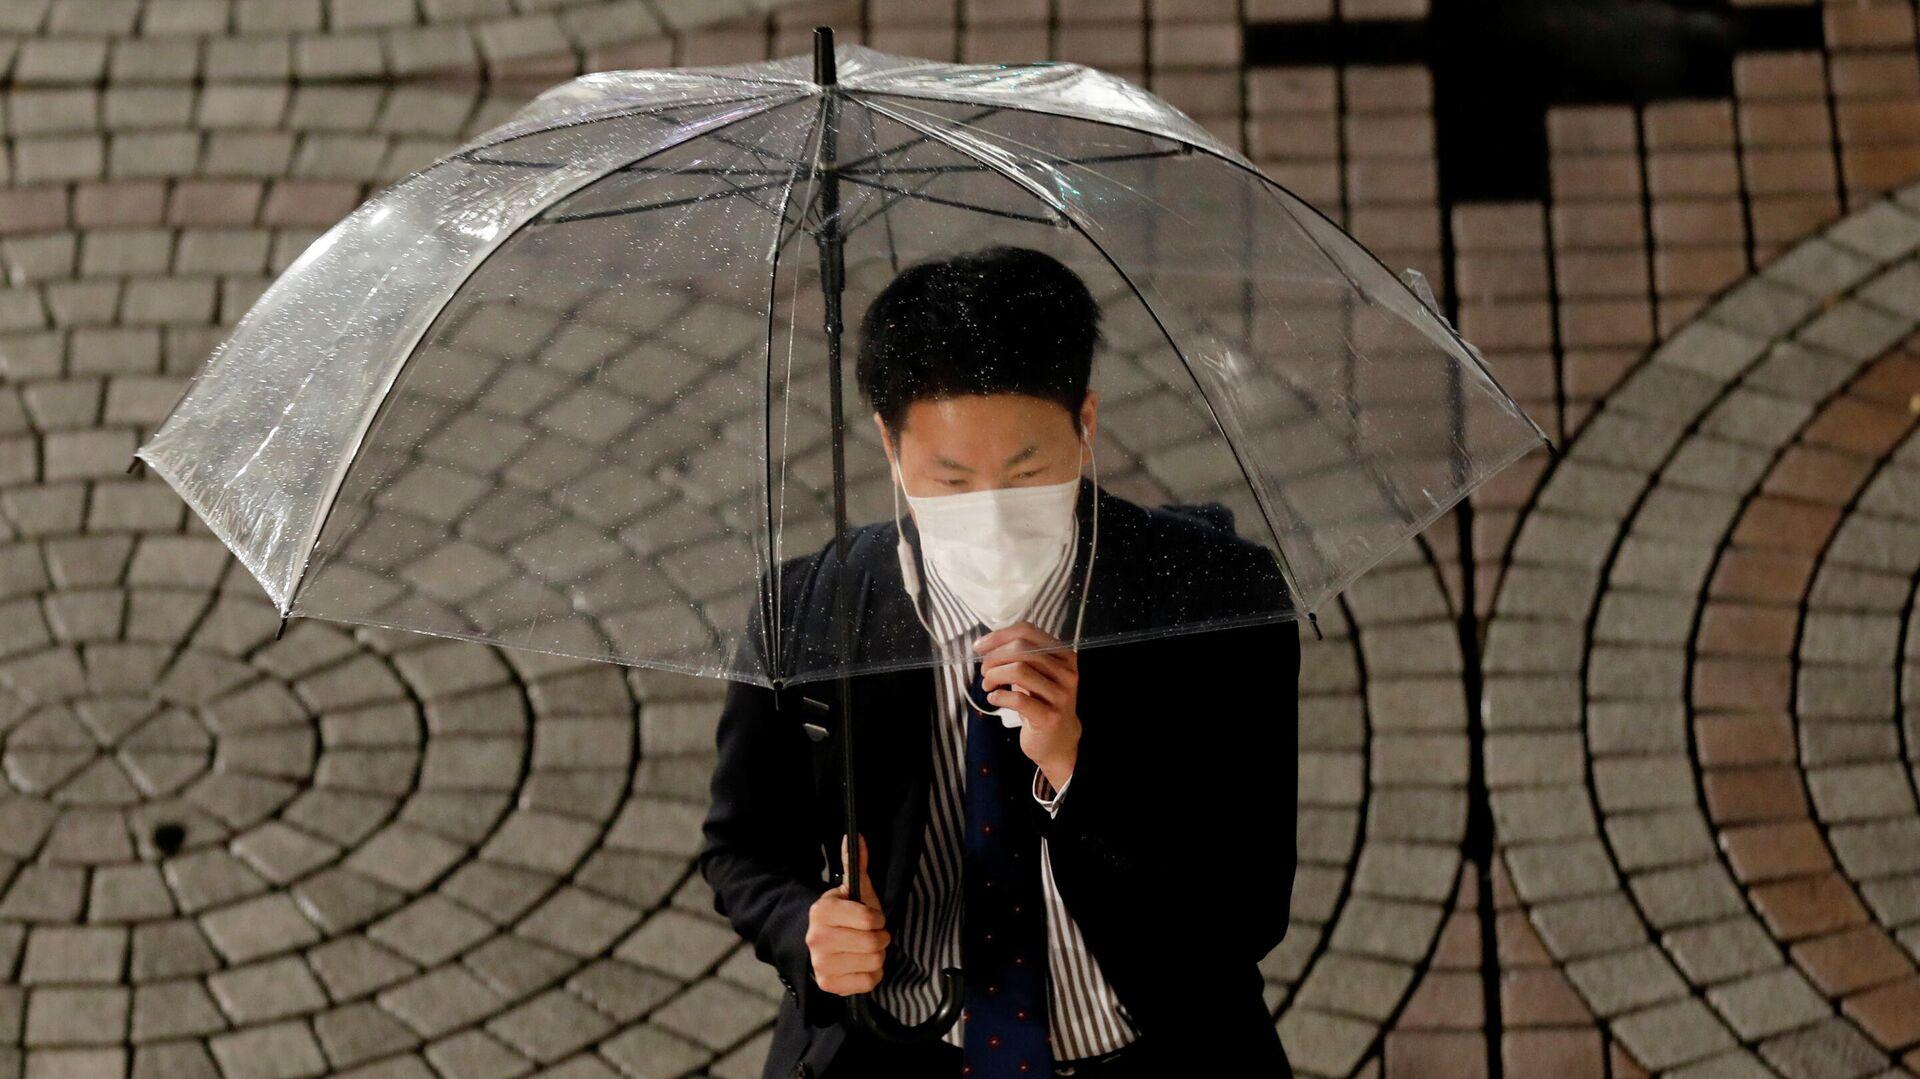 Мужчина в защитной маске в Токио, Япония - РИА Новости, 1920, 03.05.2020